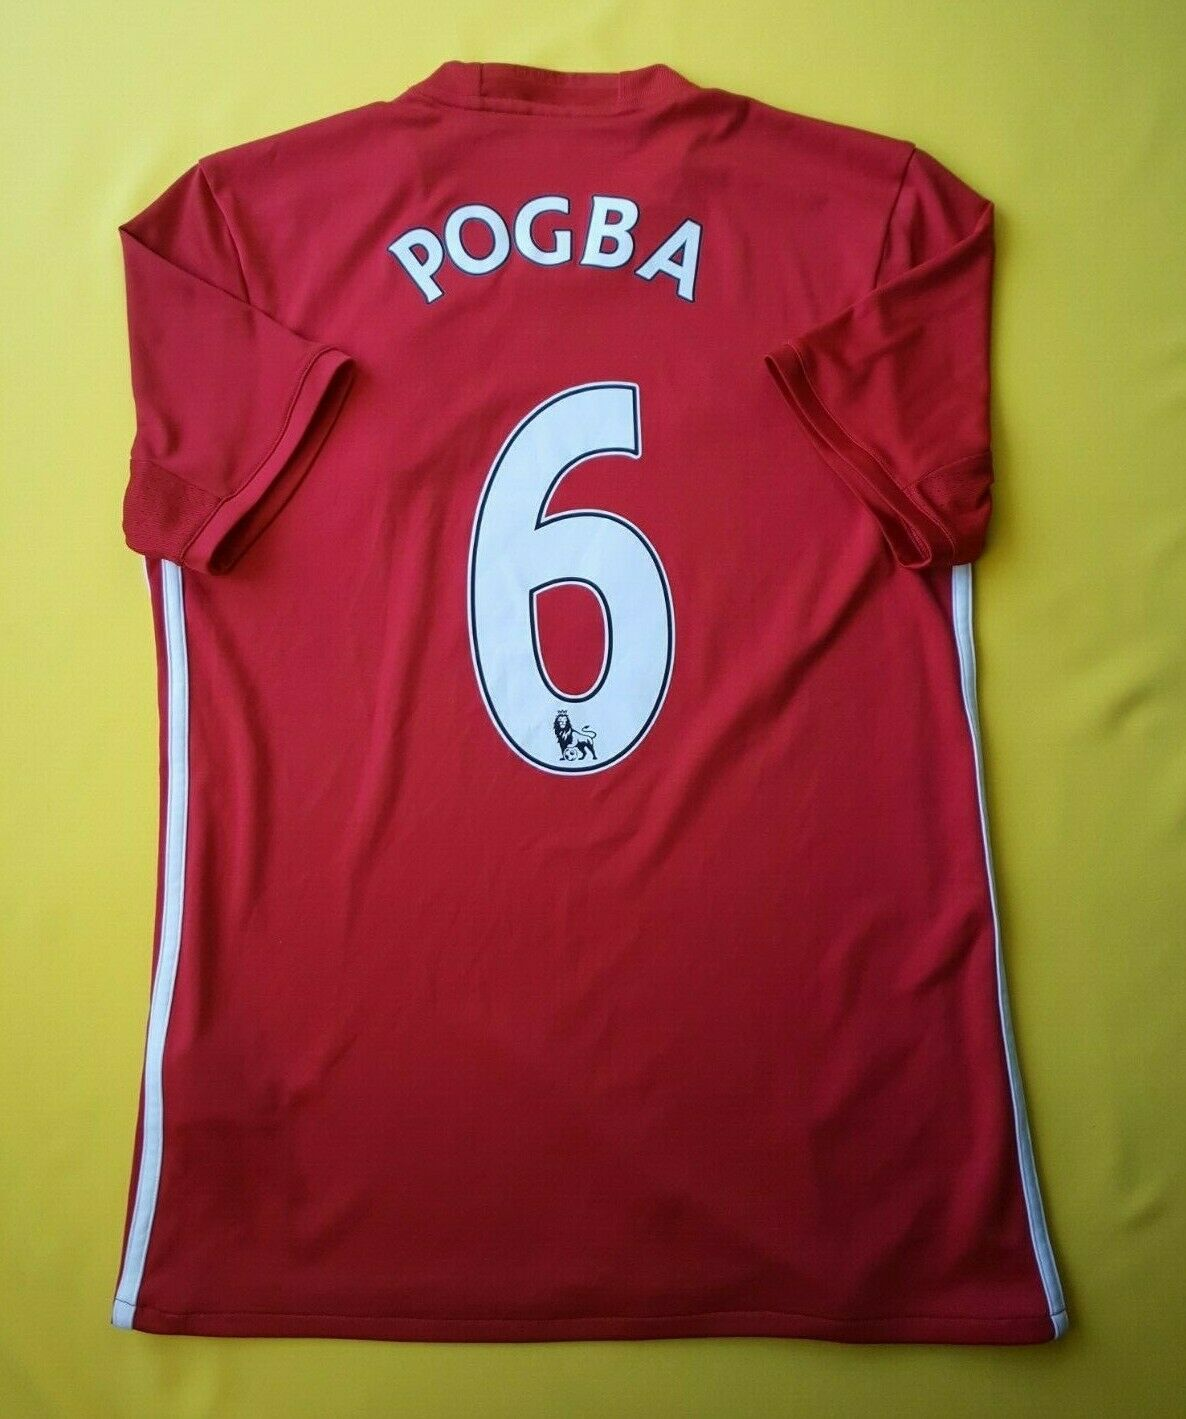 5 5 Valencia Manchester United Camisa Jersey Pequeño 2017 AI6720 De Fútbol Adidas ig93